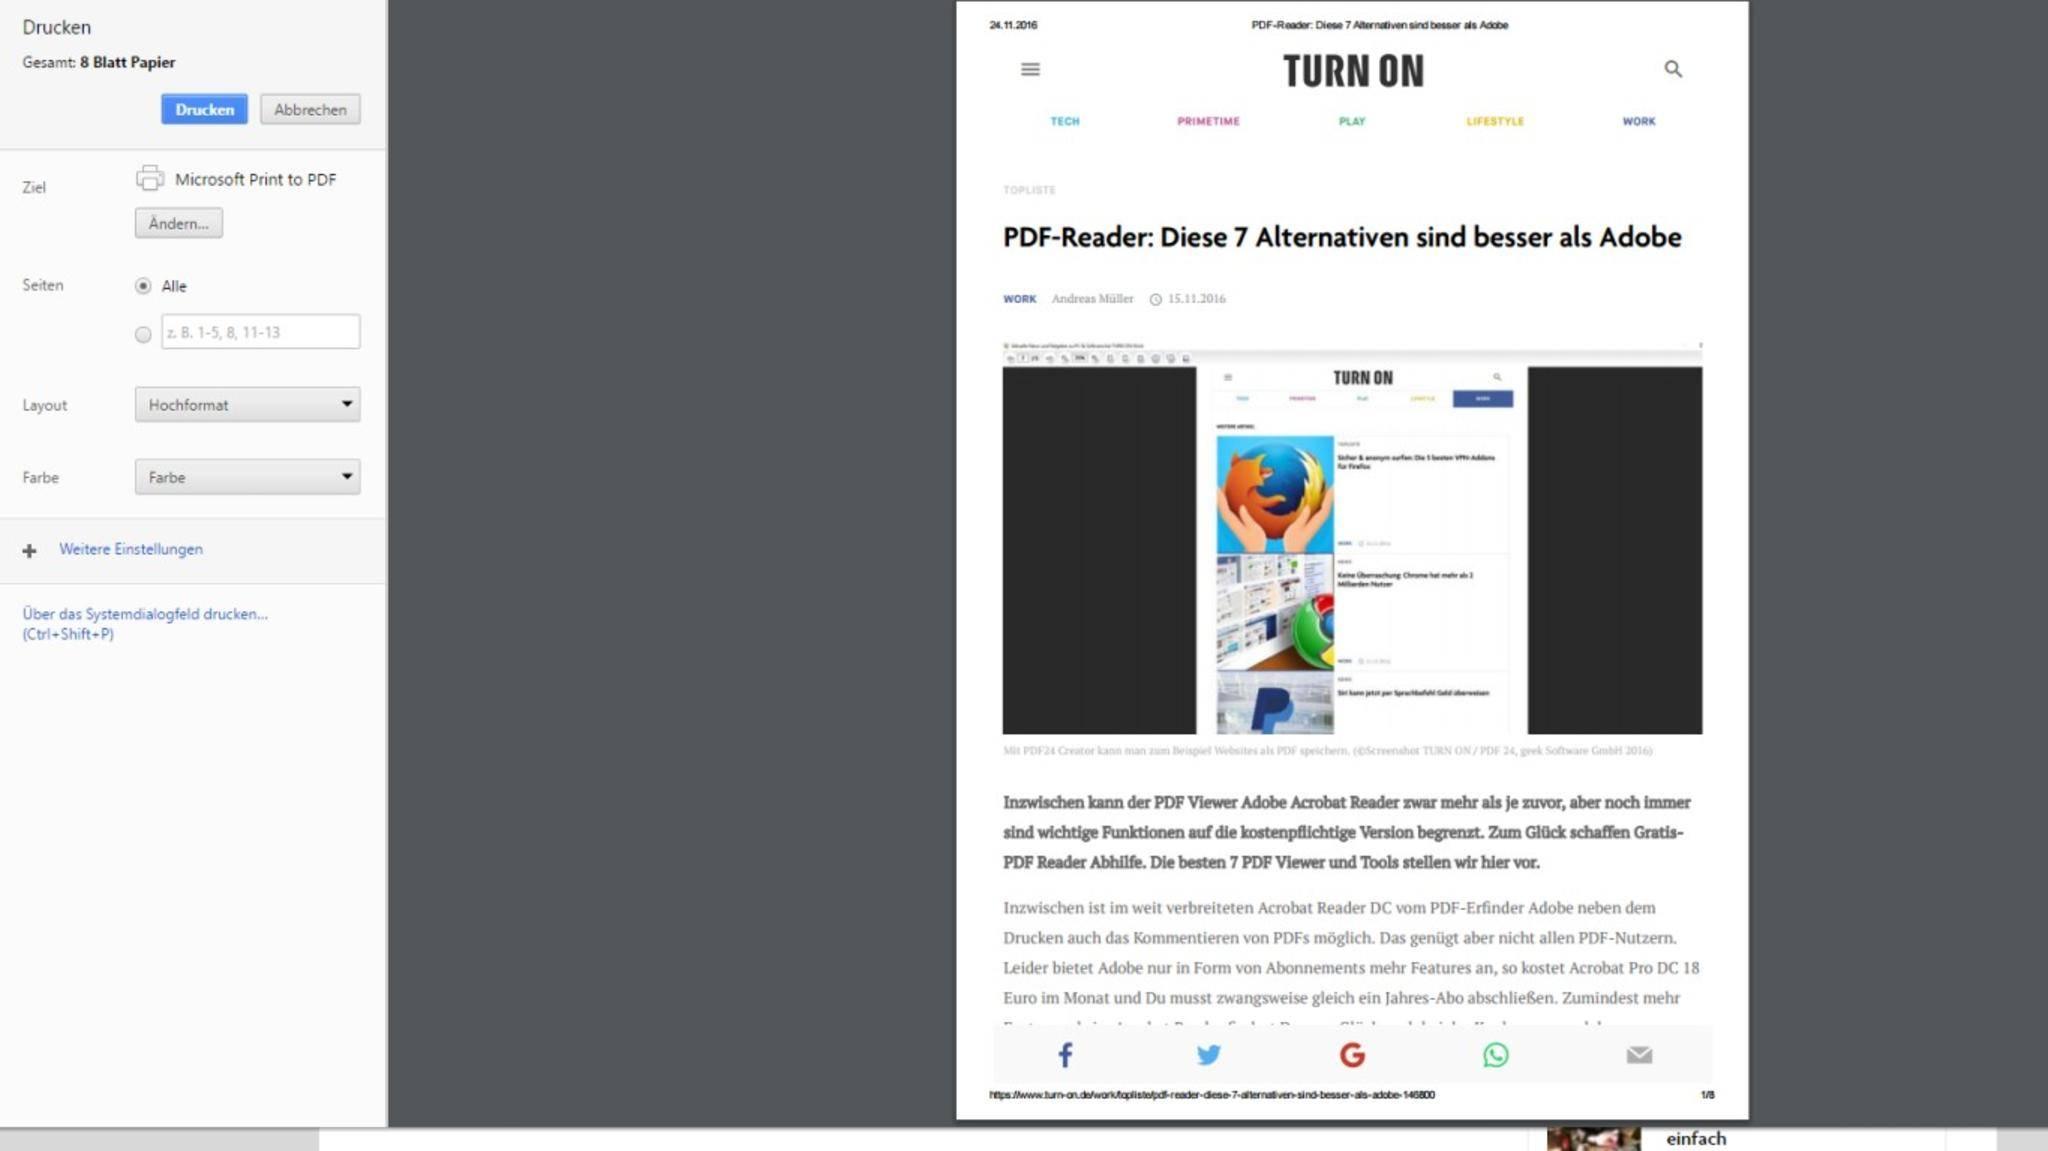 TURN ON PDF speichern Microsoft Print to PDF